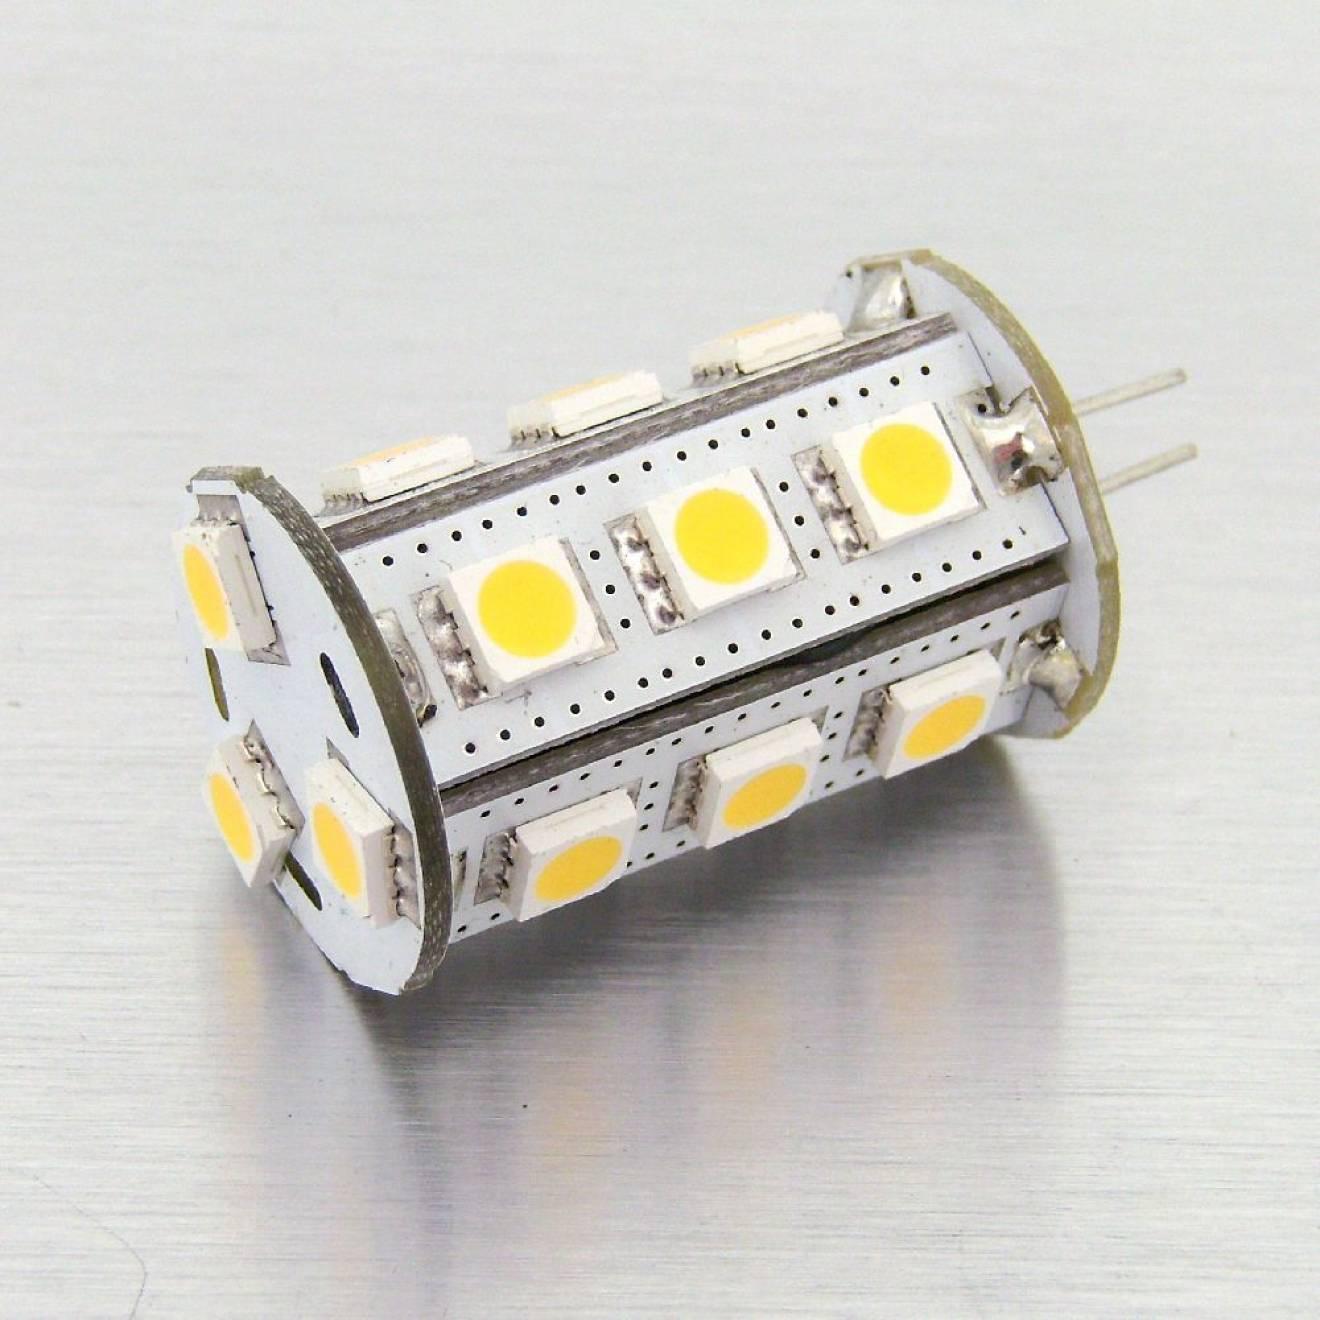 highpower g4 led stiftsockellampe warmwei 270 lumen. Black Bedroom Furniture Sets. Home Design Ideas